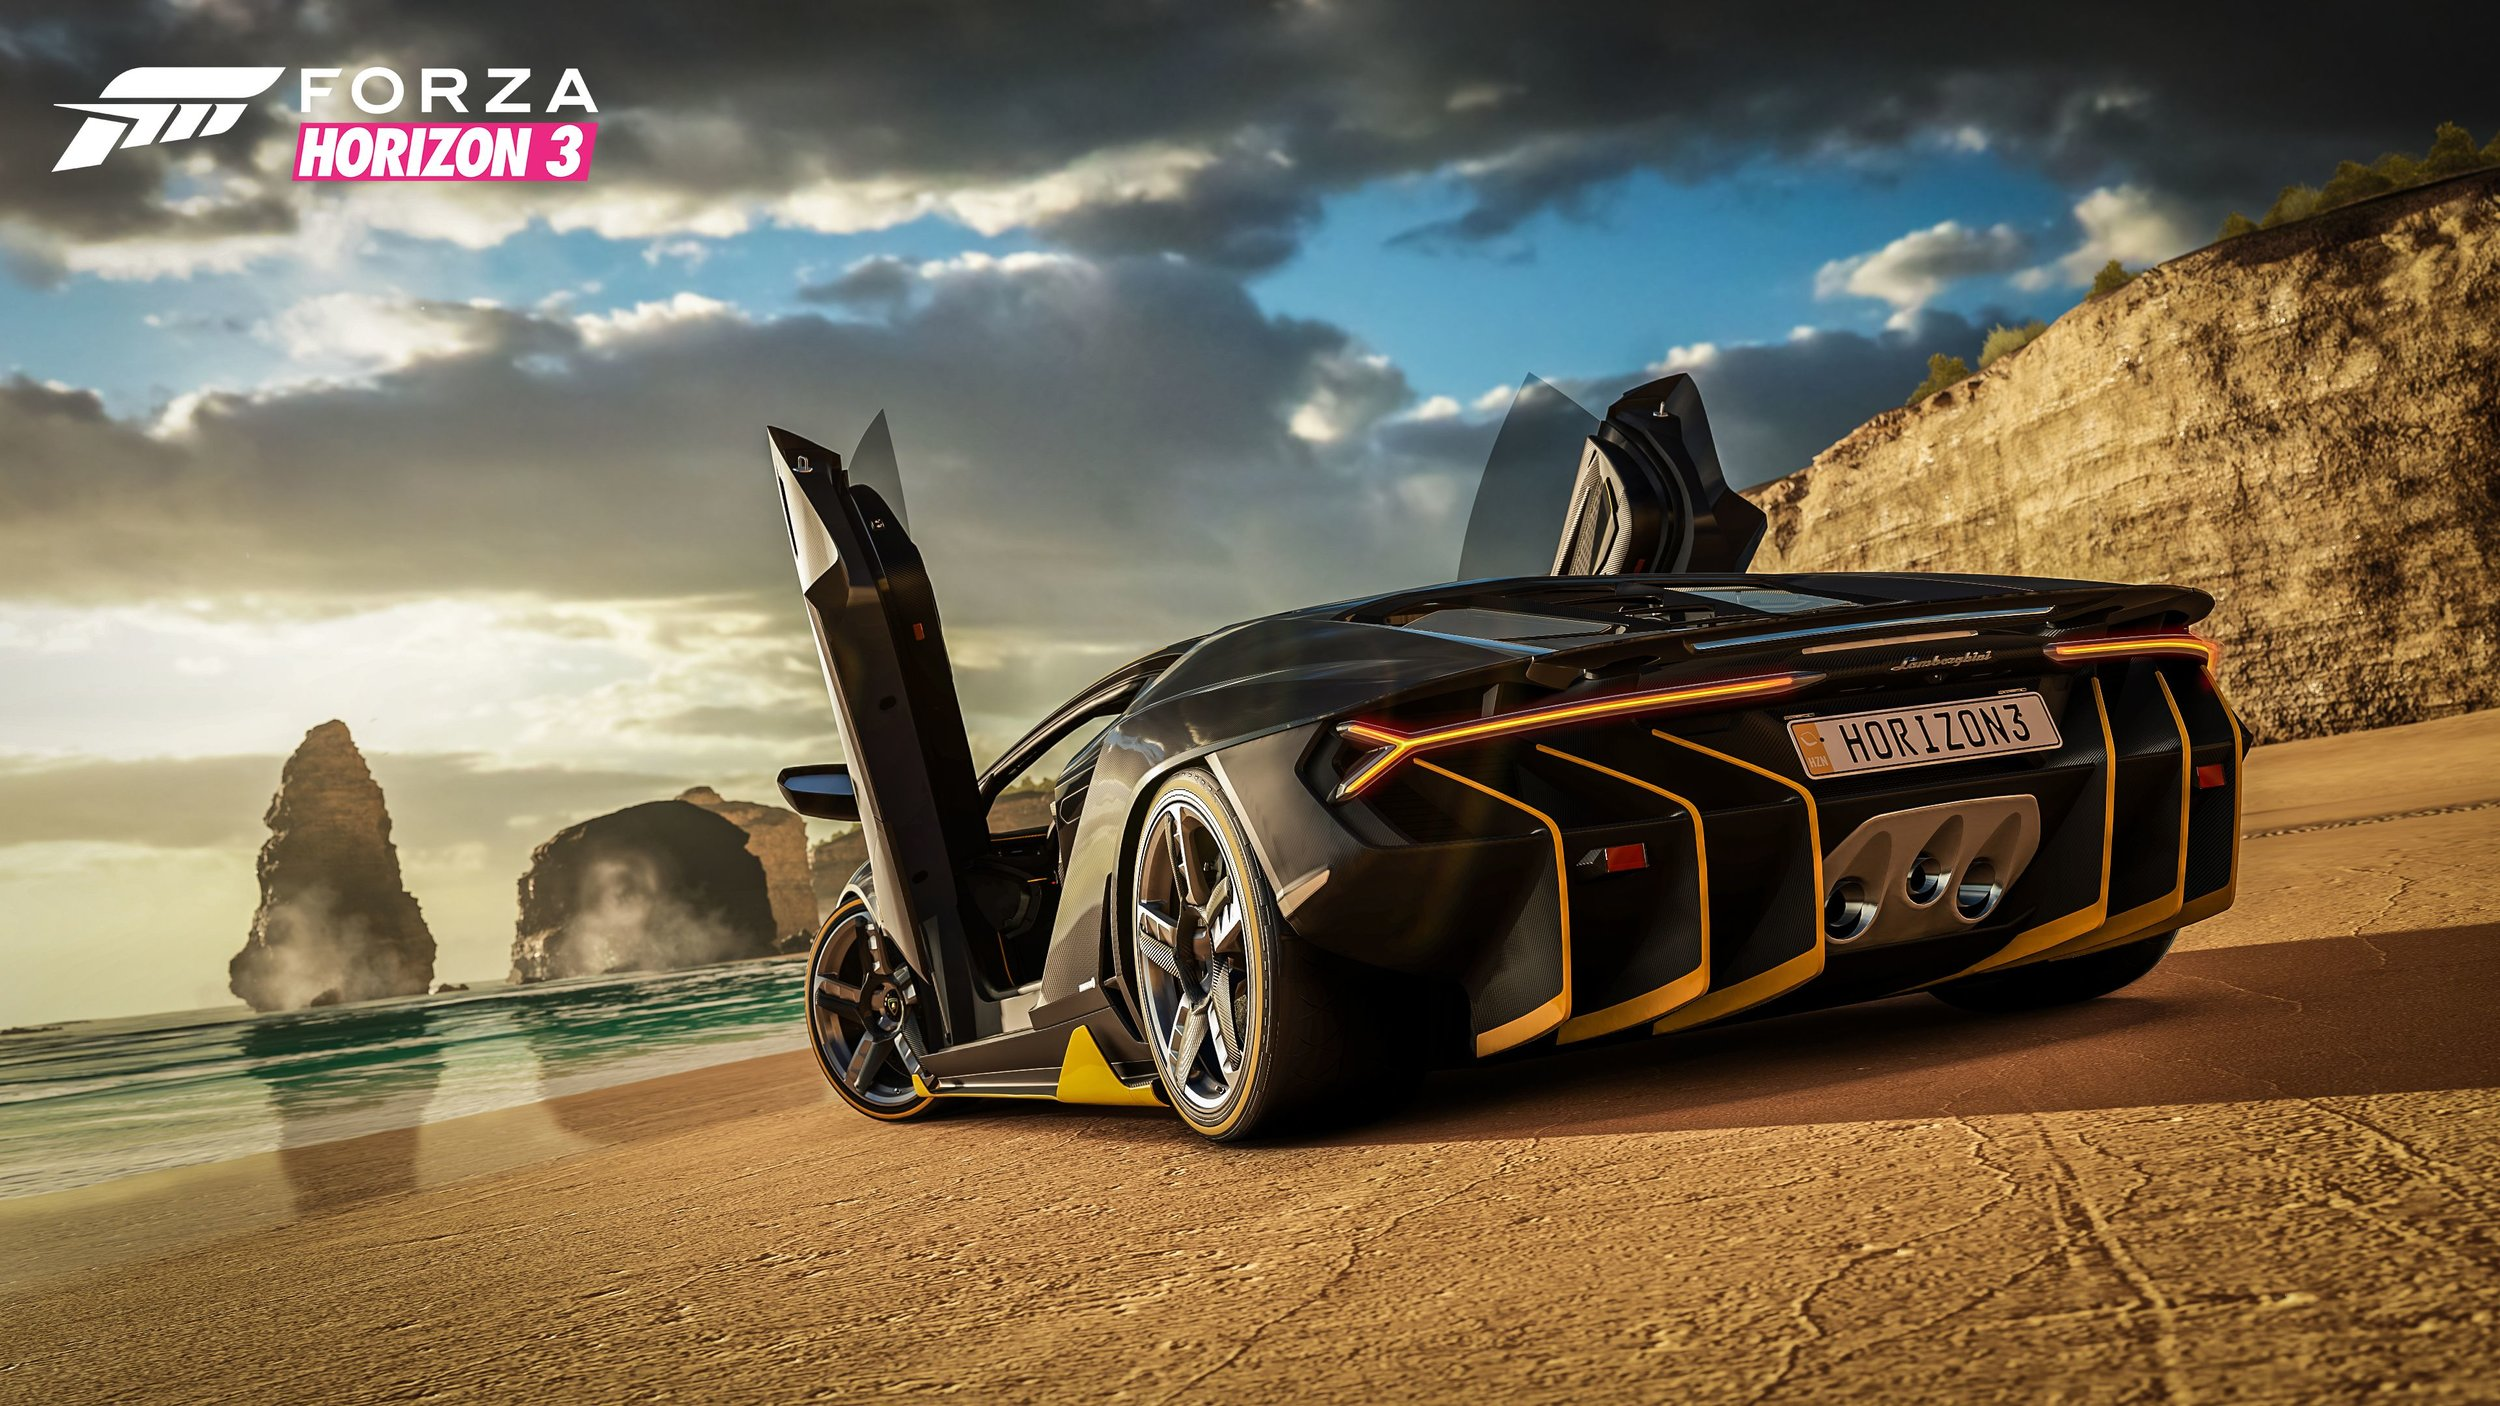 ForzaHorizon3_E3PressKit_LamborghiniBeach_WM.jpg